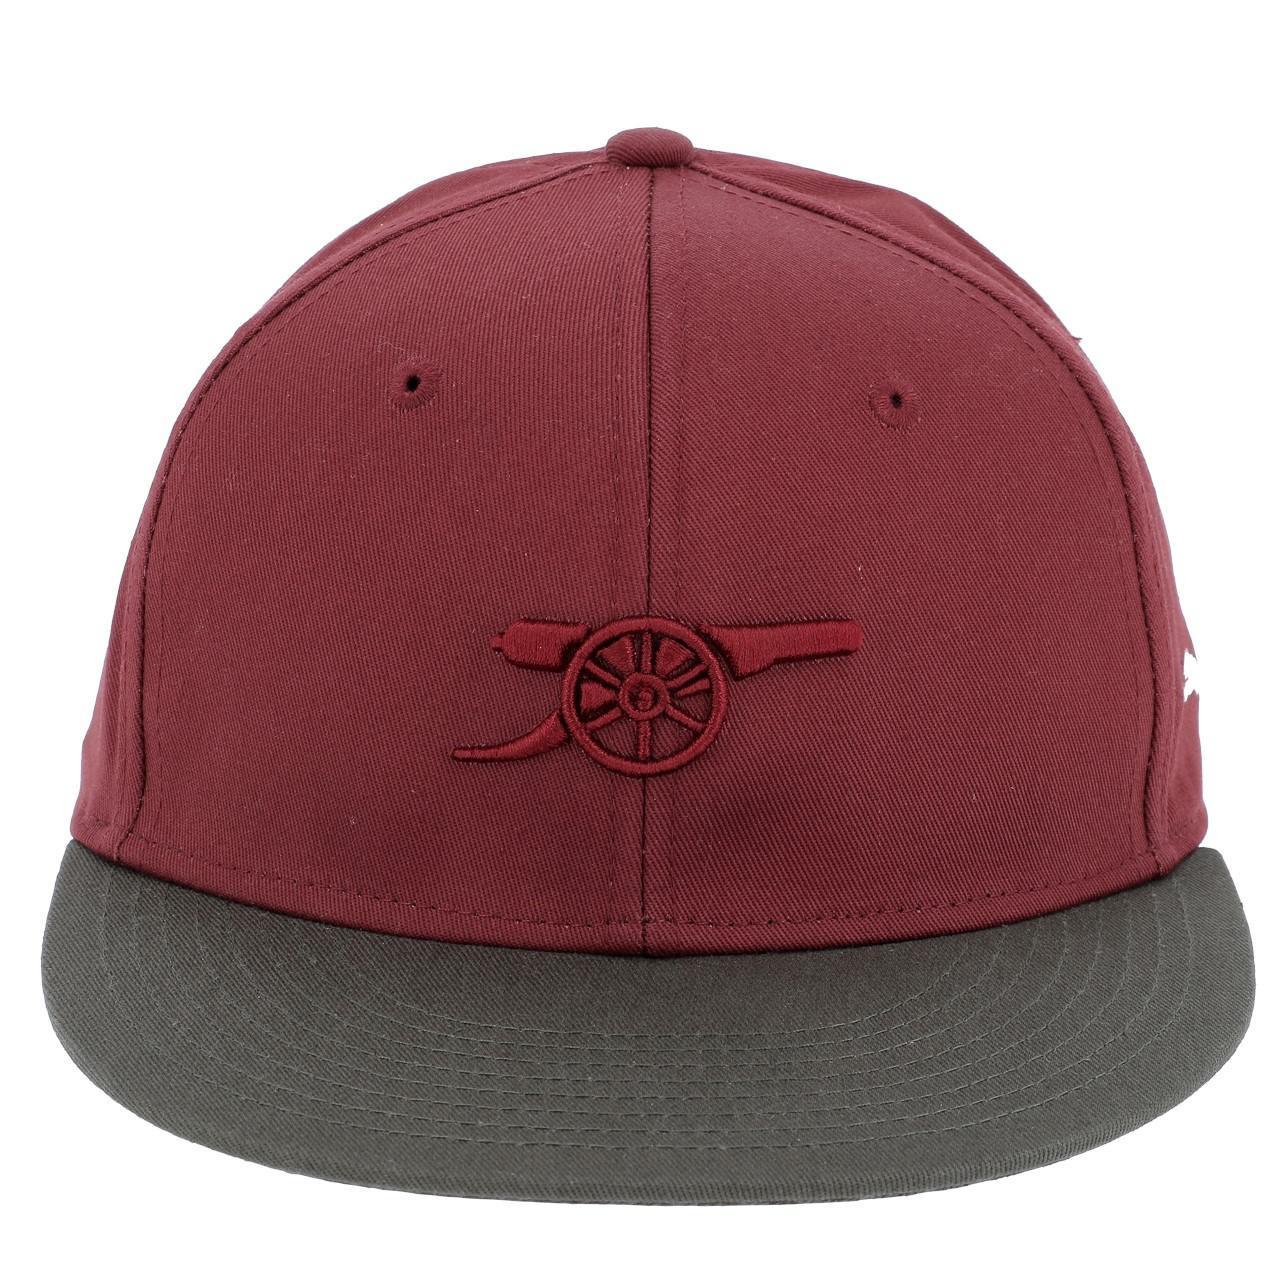 Cap-American-Puma-Arsenal-Cap-Dbx-Khaki-Red-12777-New thumbnail 3